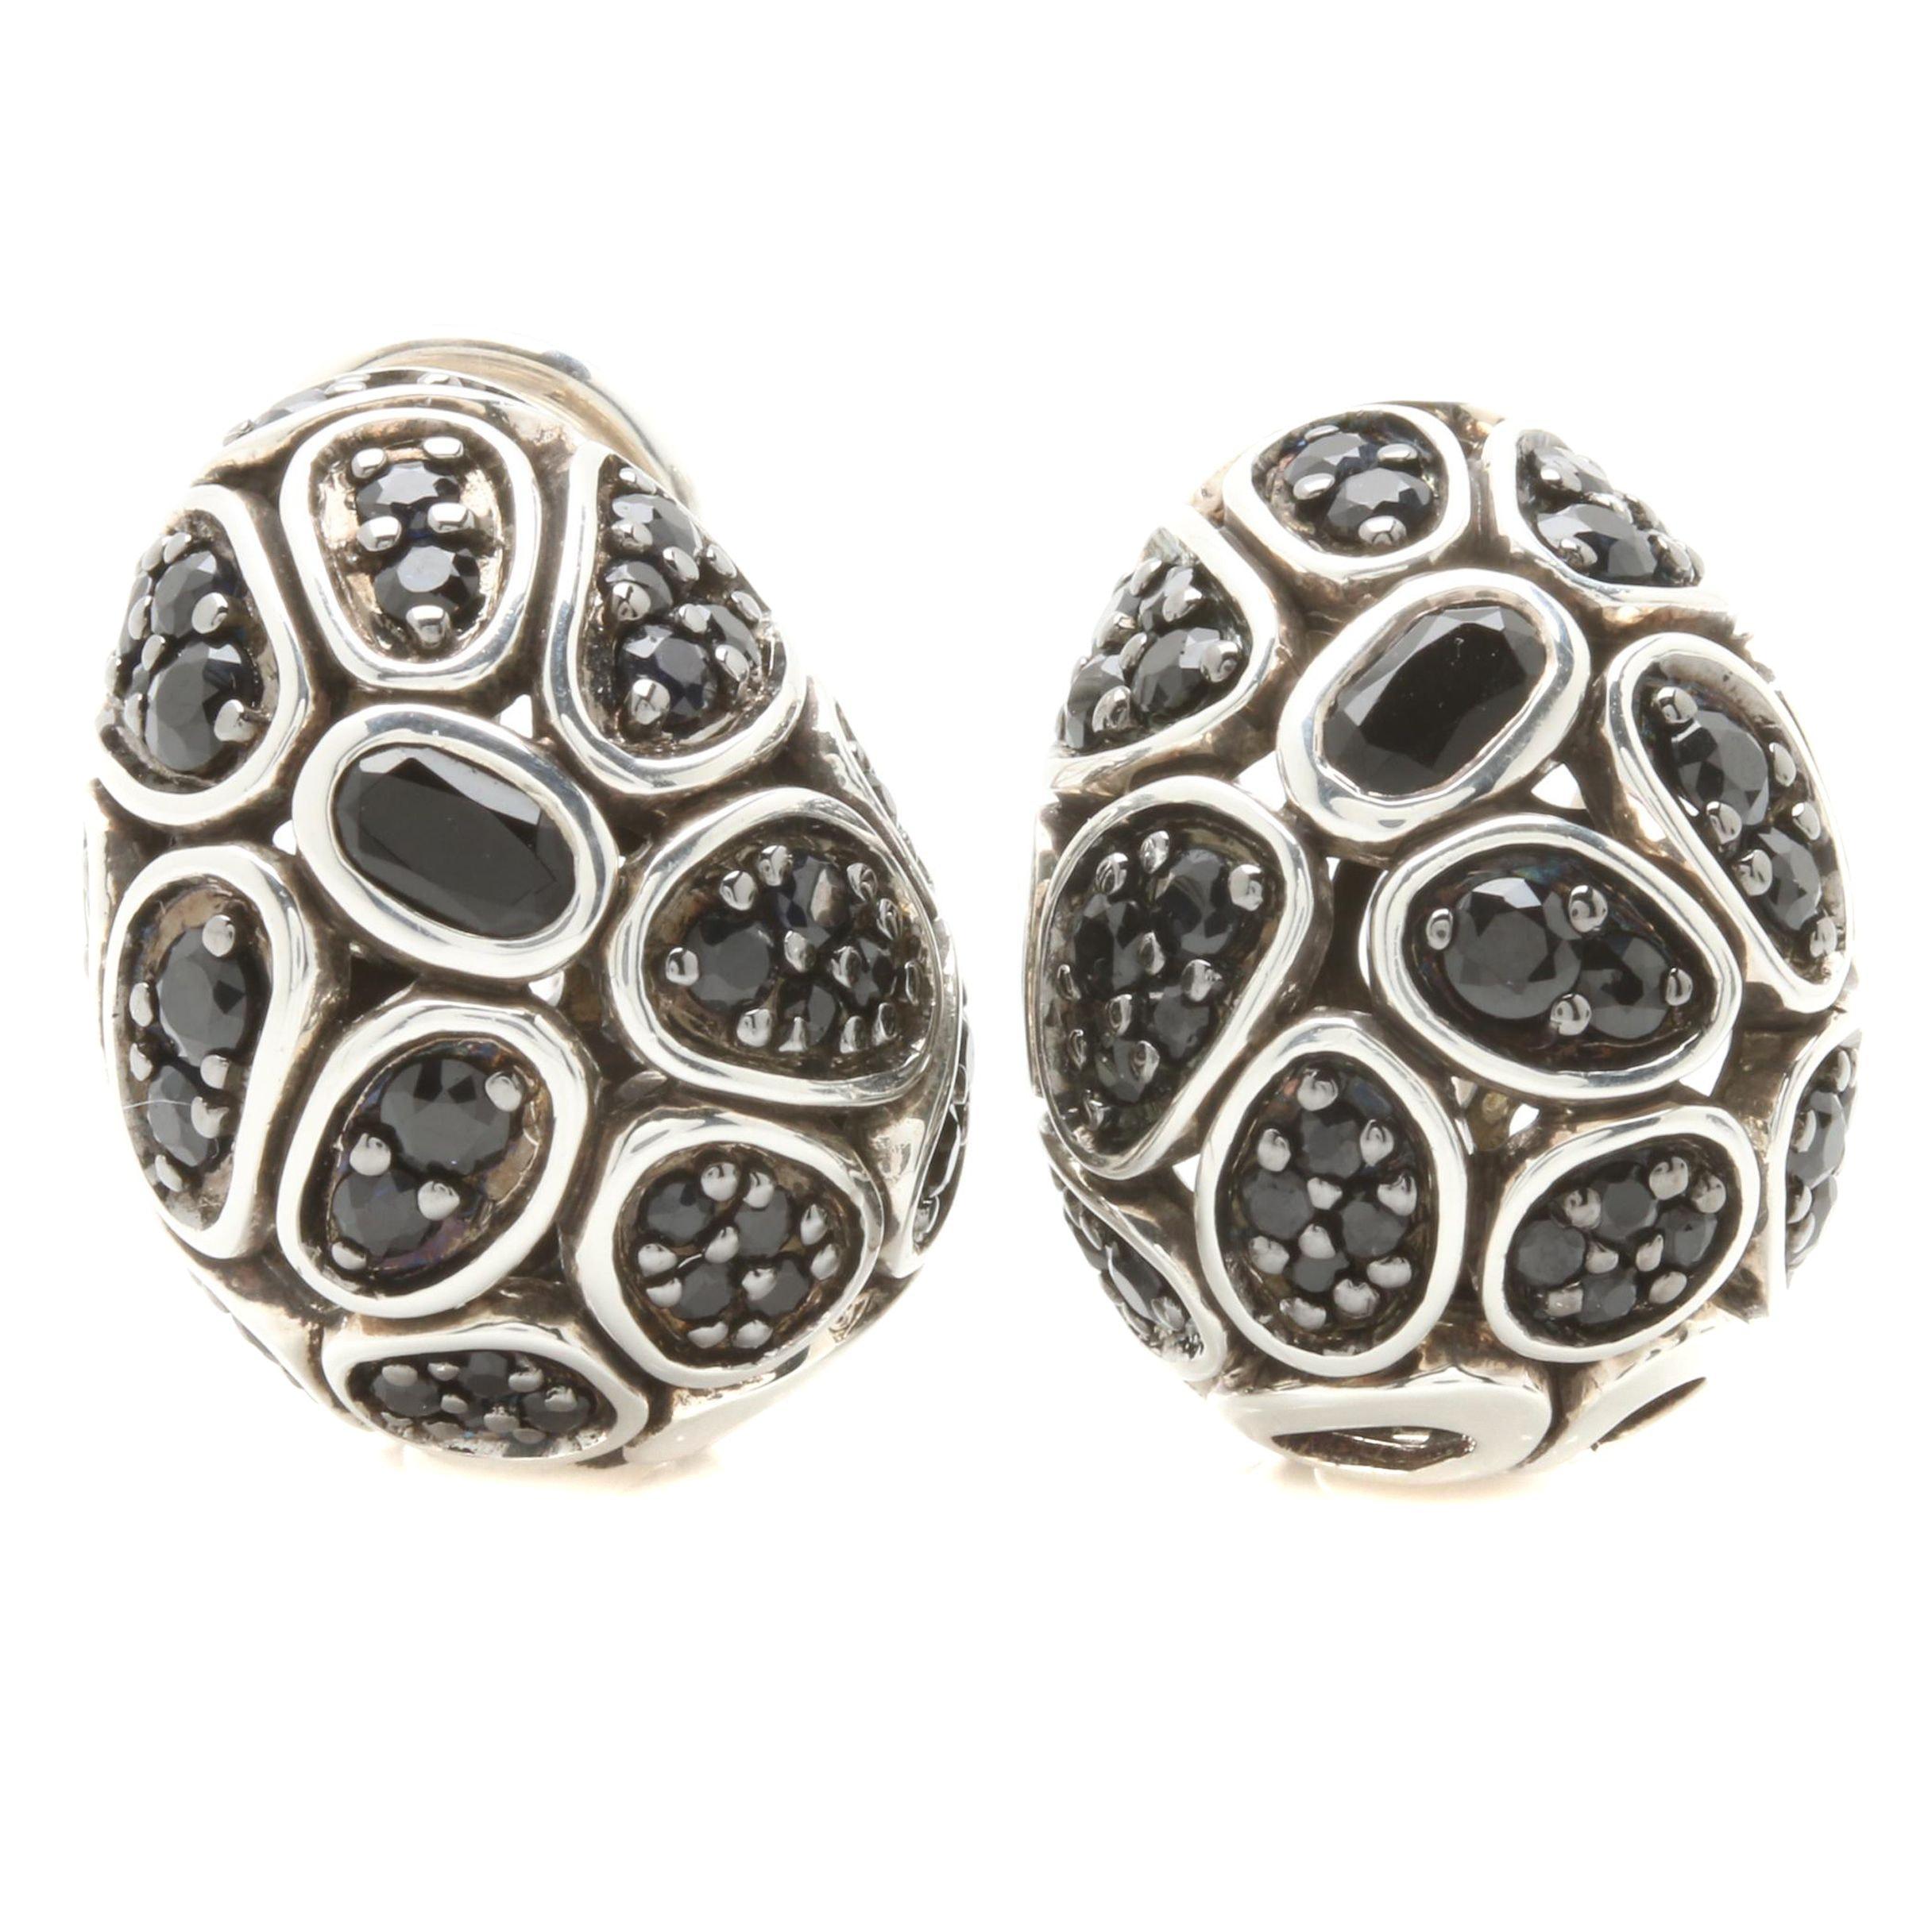 John Hardy Sterling Silver Black Onyx and Black Sapphire Earrings